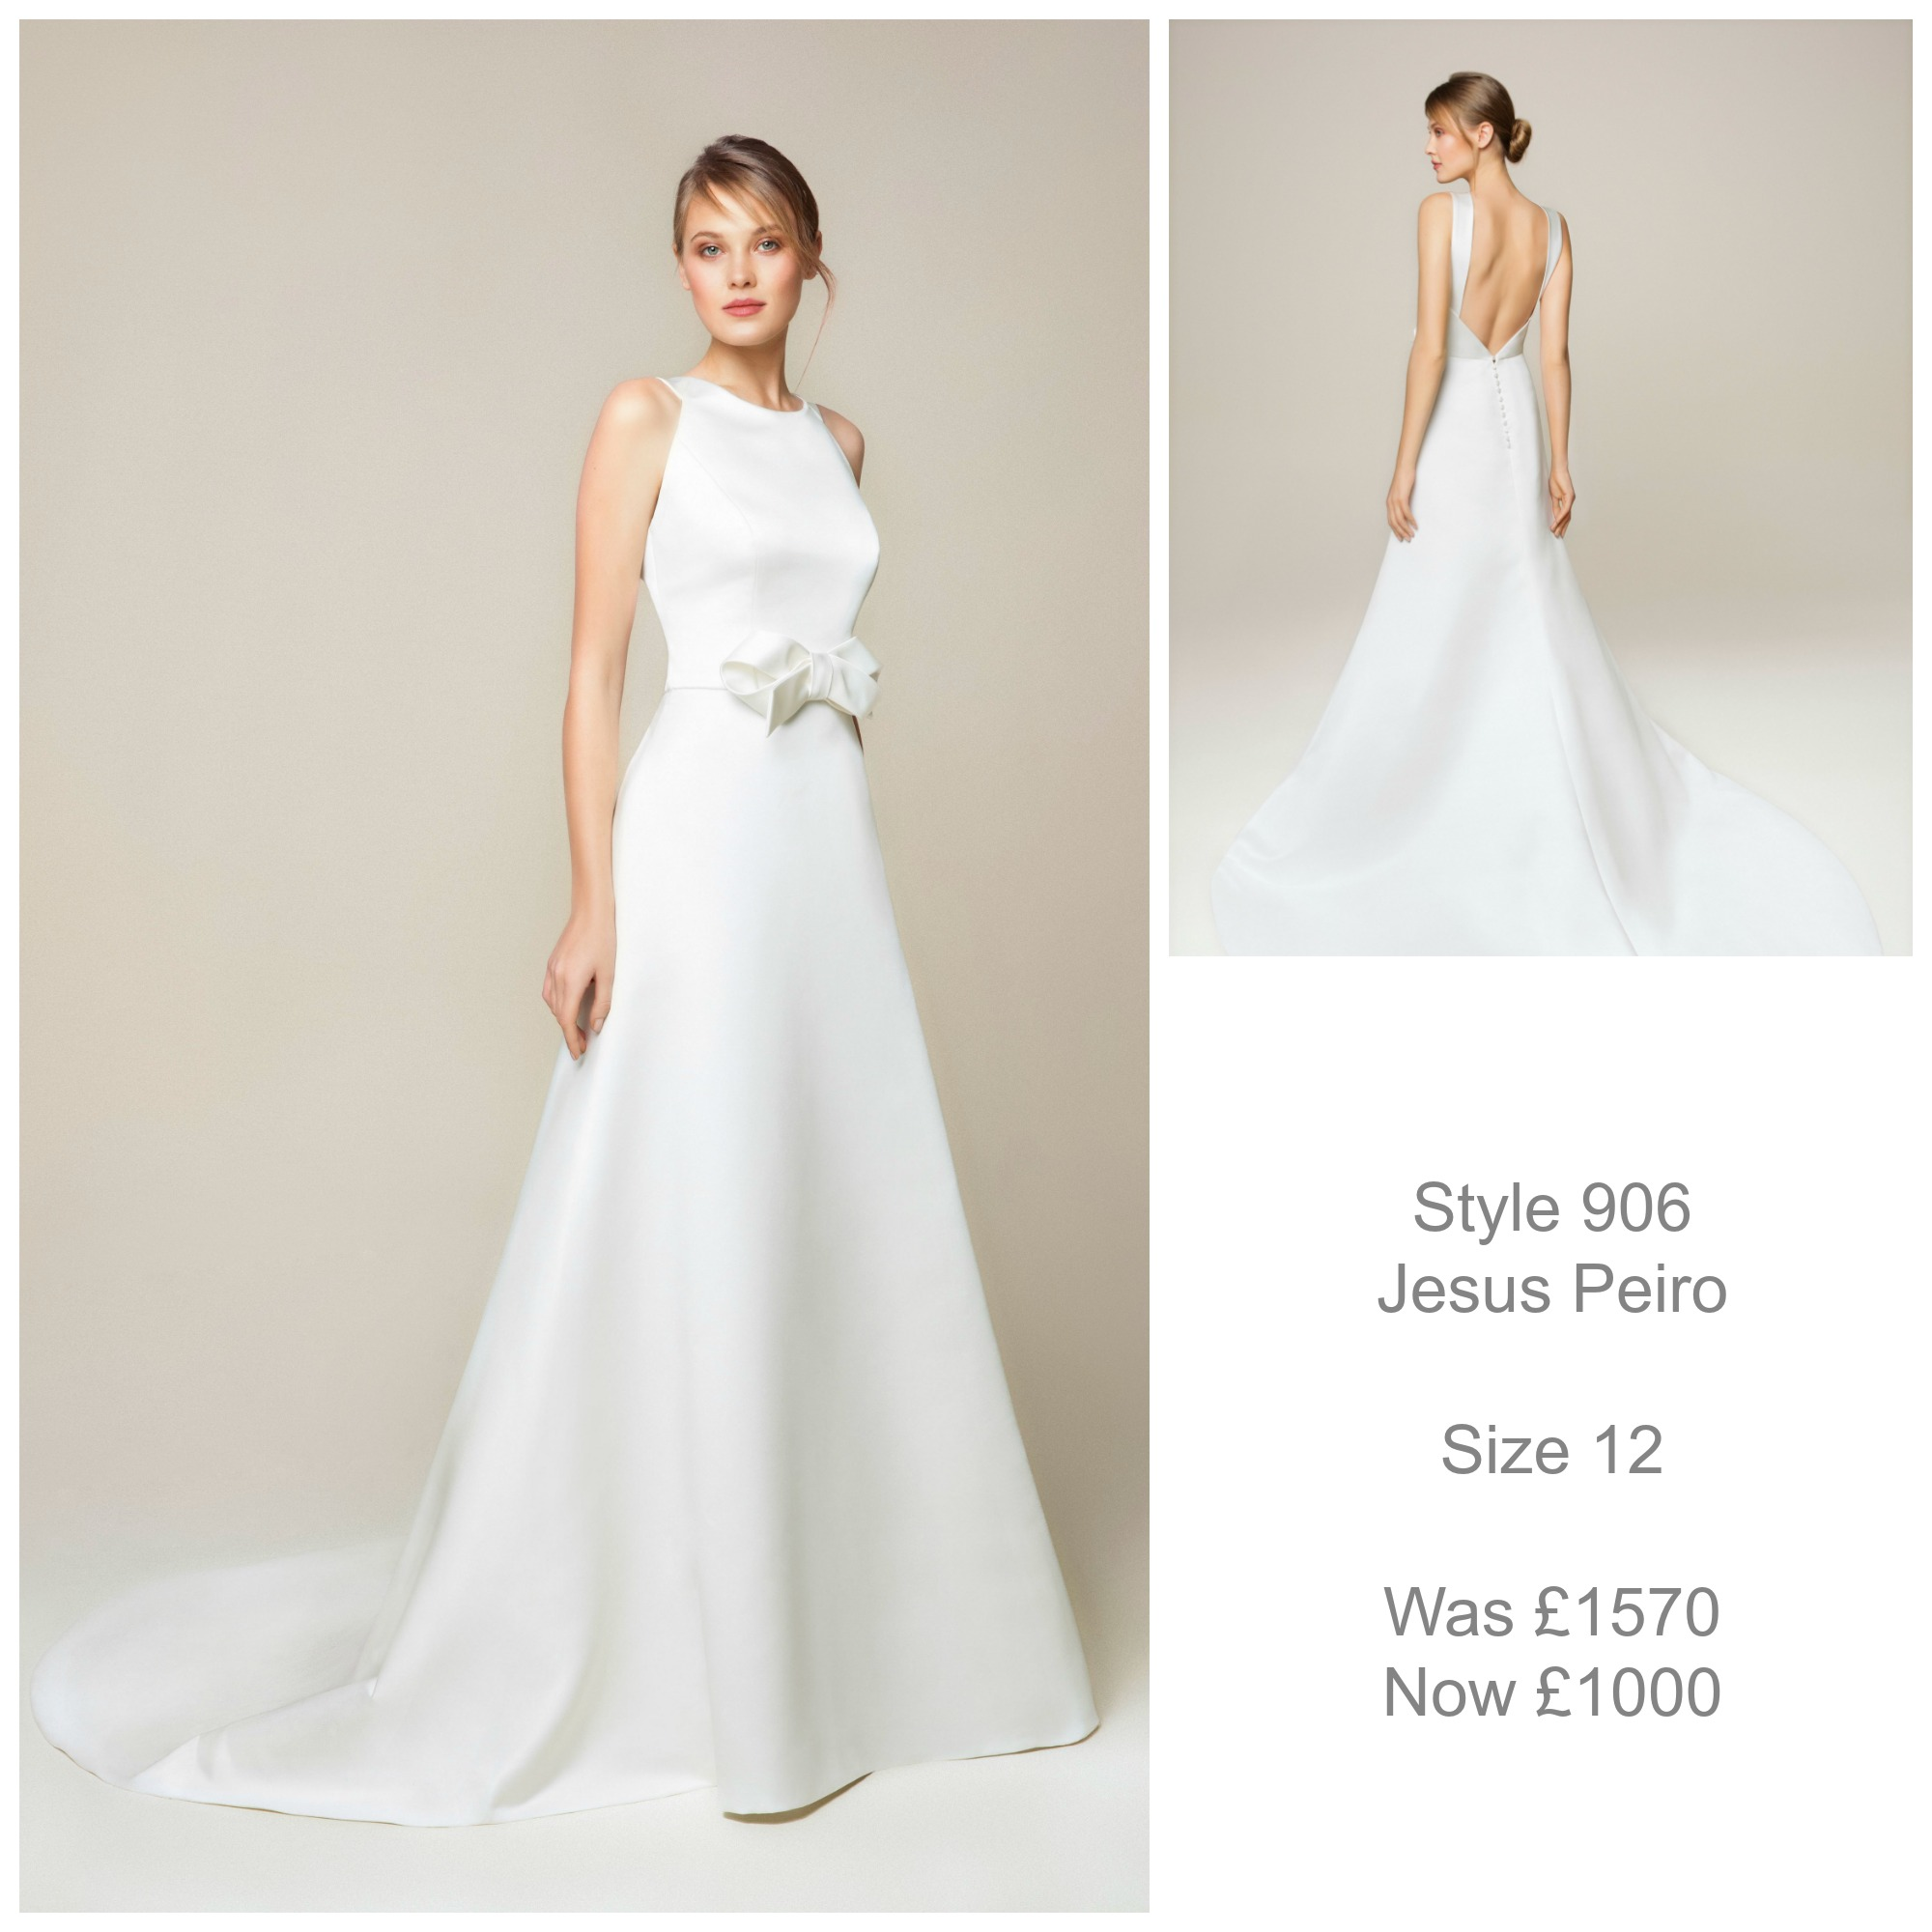 Spring Wedding Dress Sale Cicily Bridal